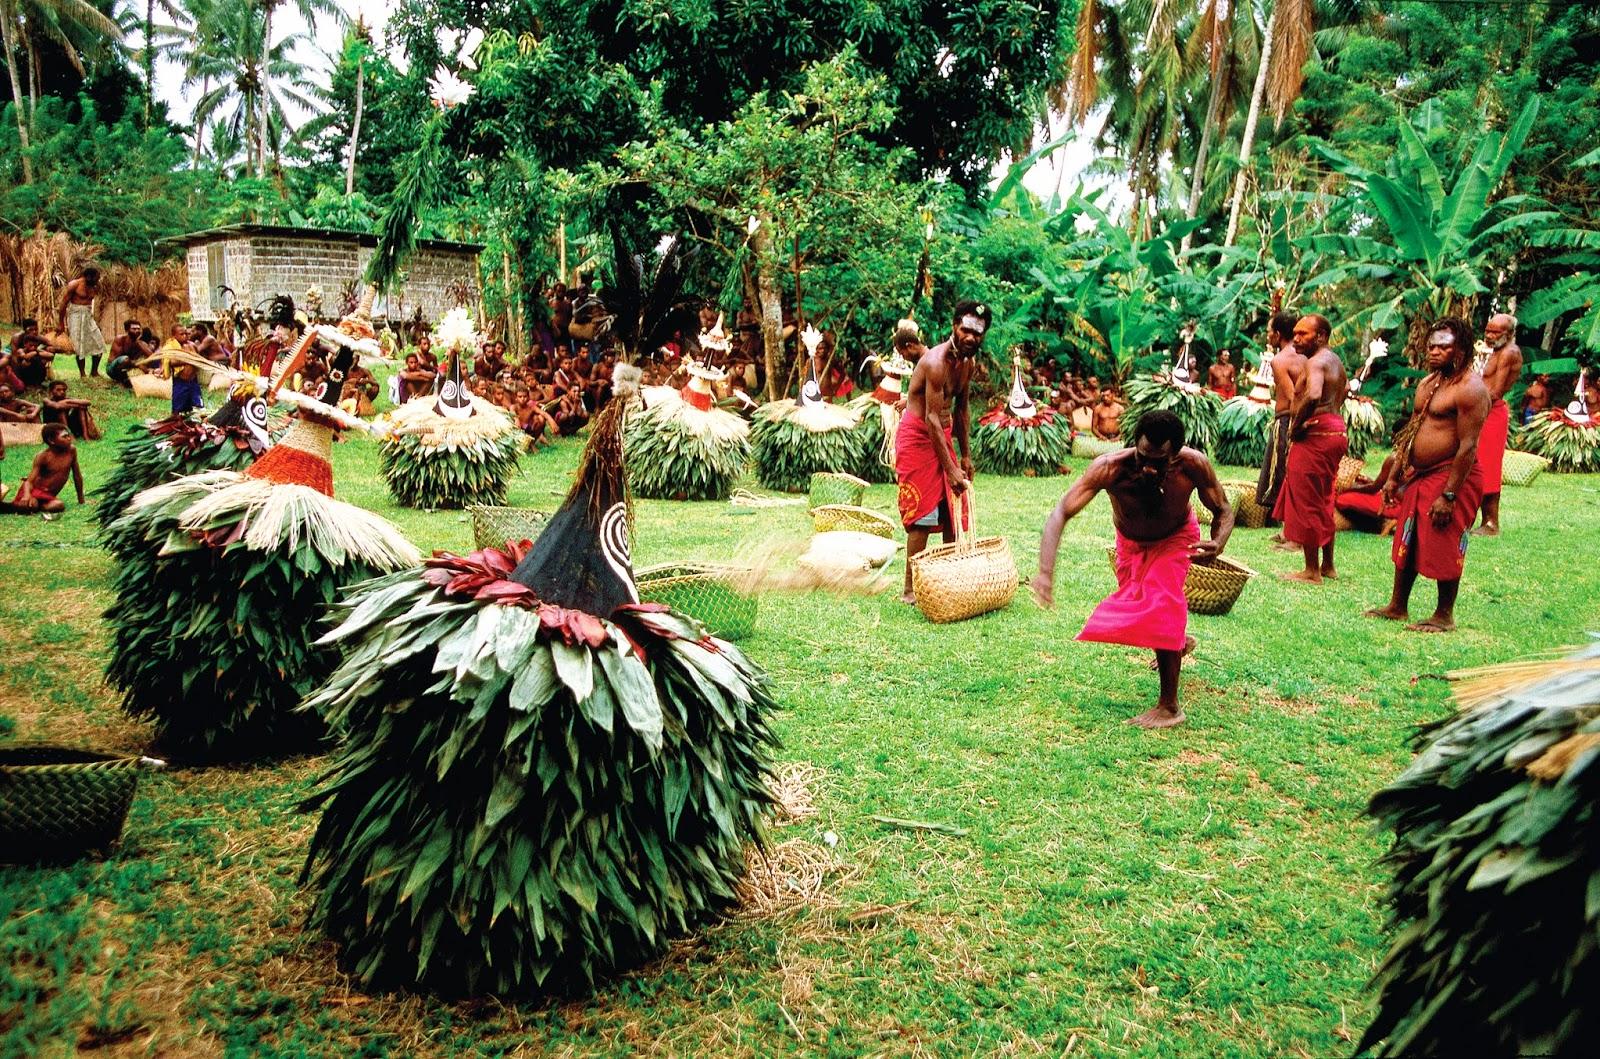 TOLAI DUK DUK CEREMONY - Papua New Guinea